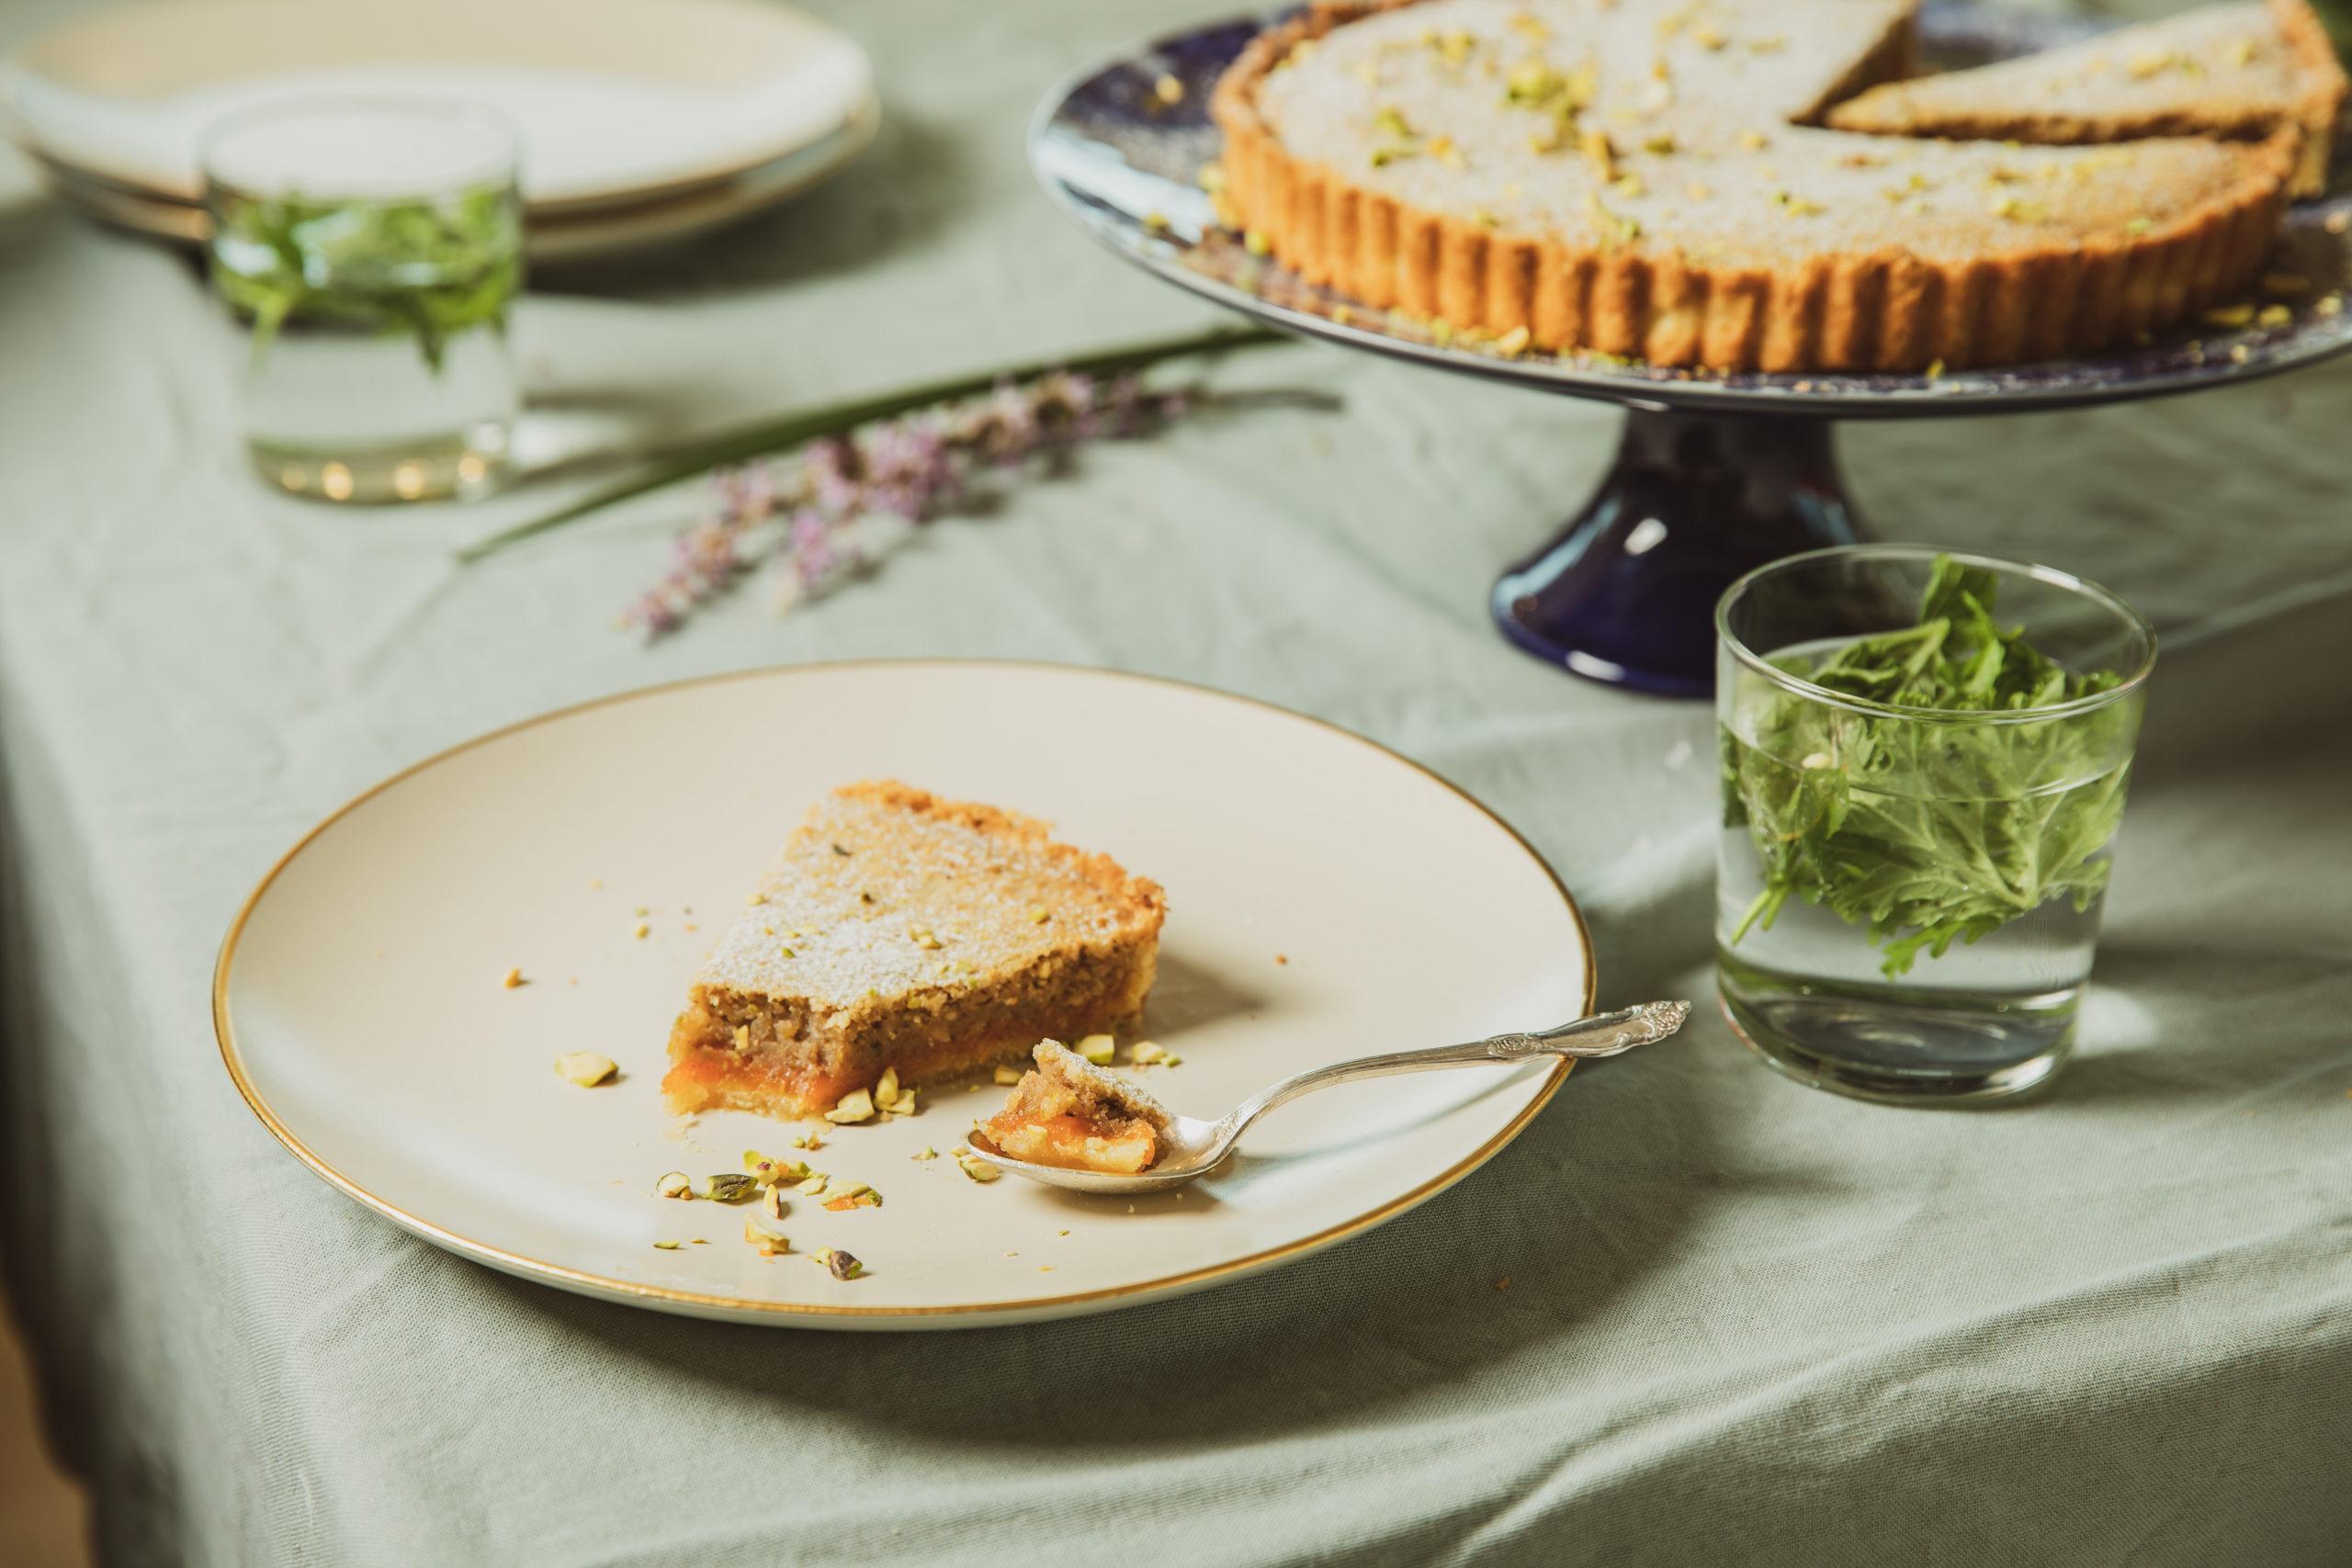 Slice of pumpkin jam tart on a cream colored plate